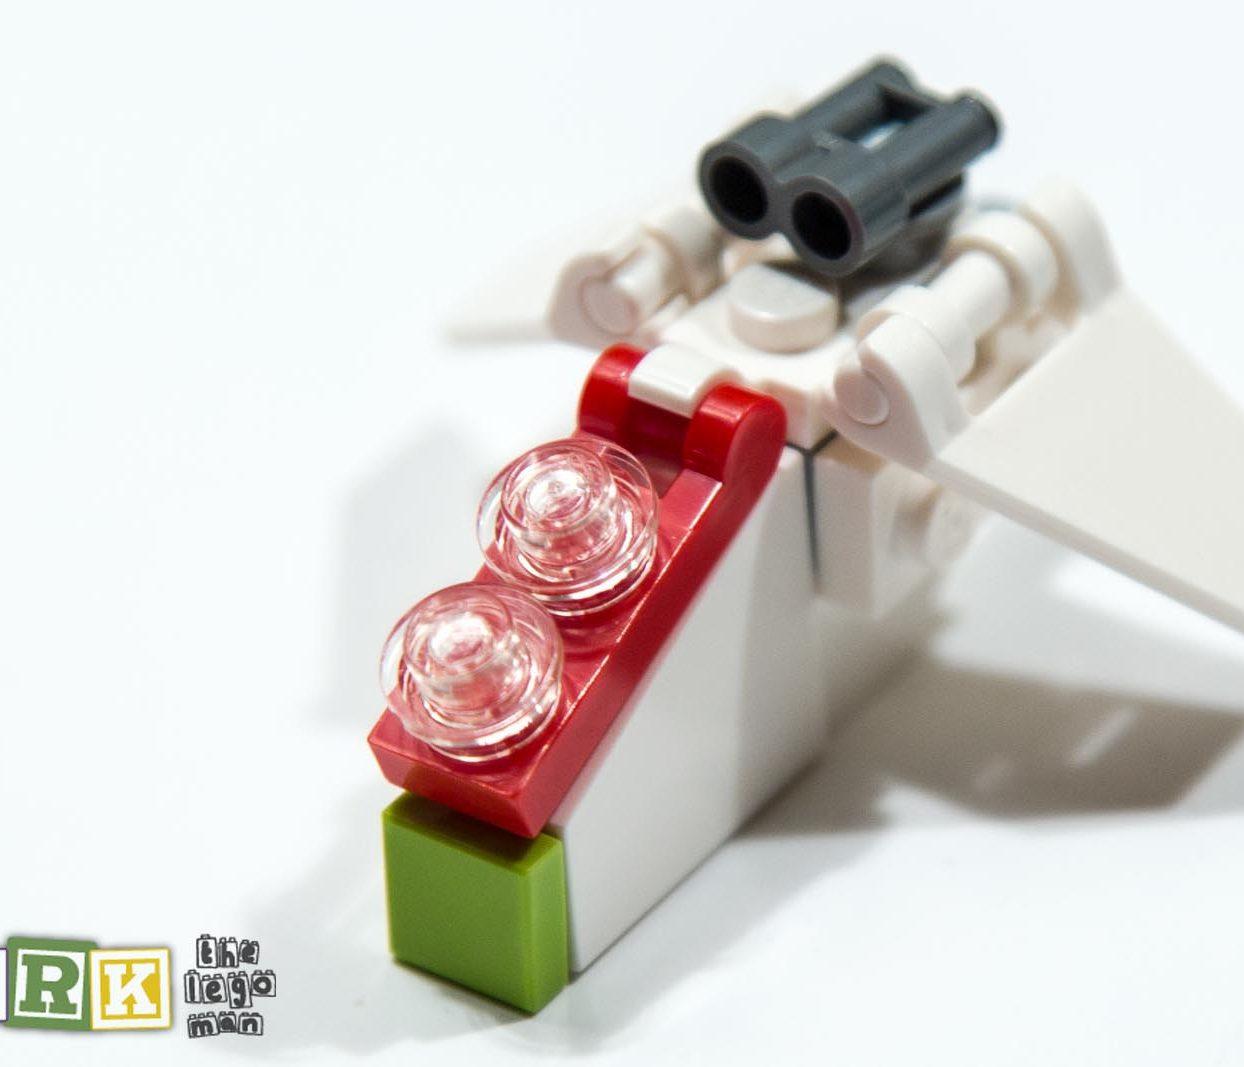 NEW Lego Star Wars Micro Ship Republic Gunship